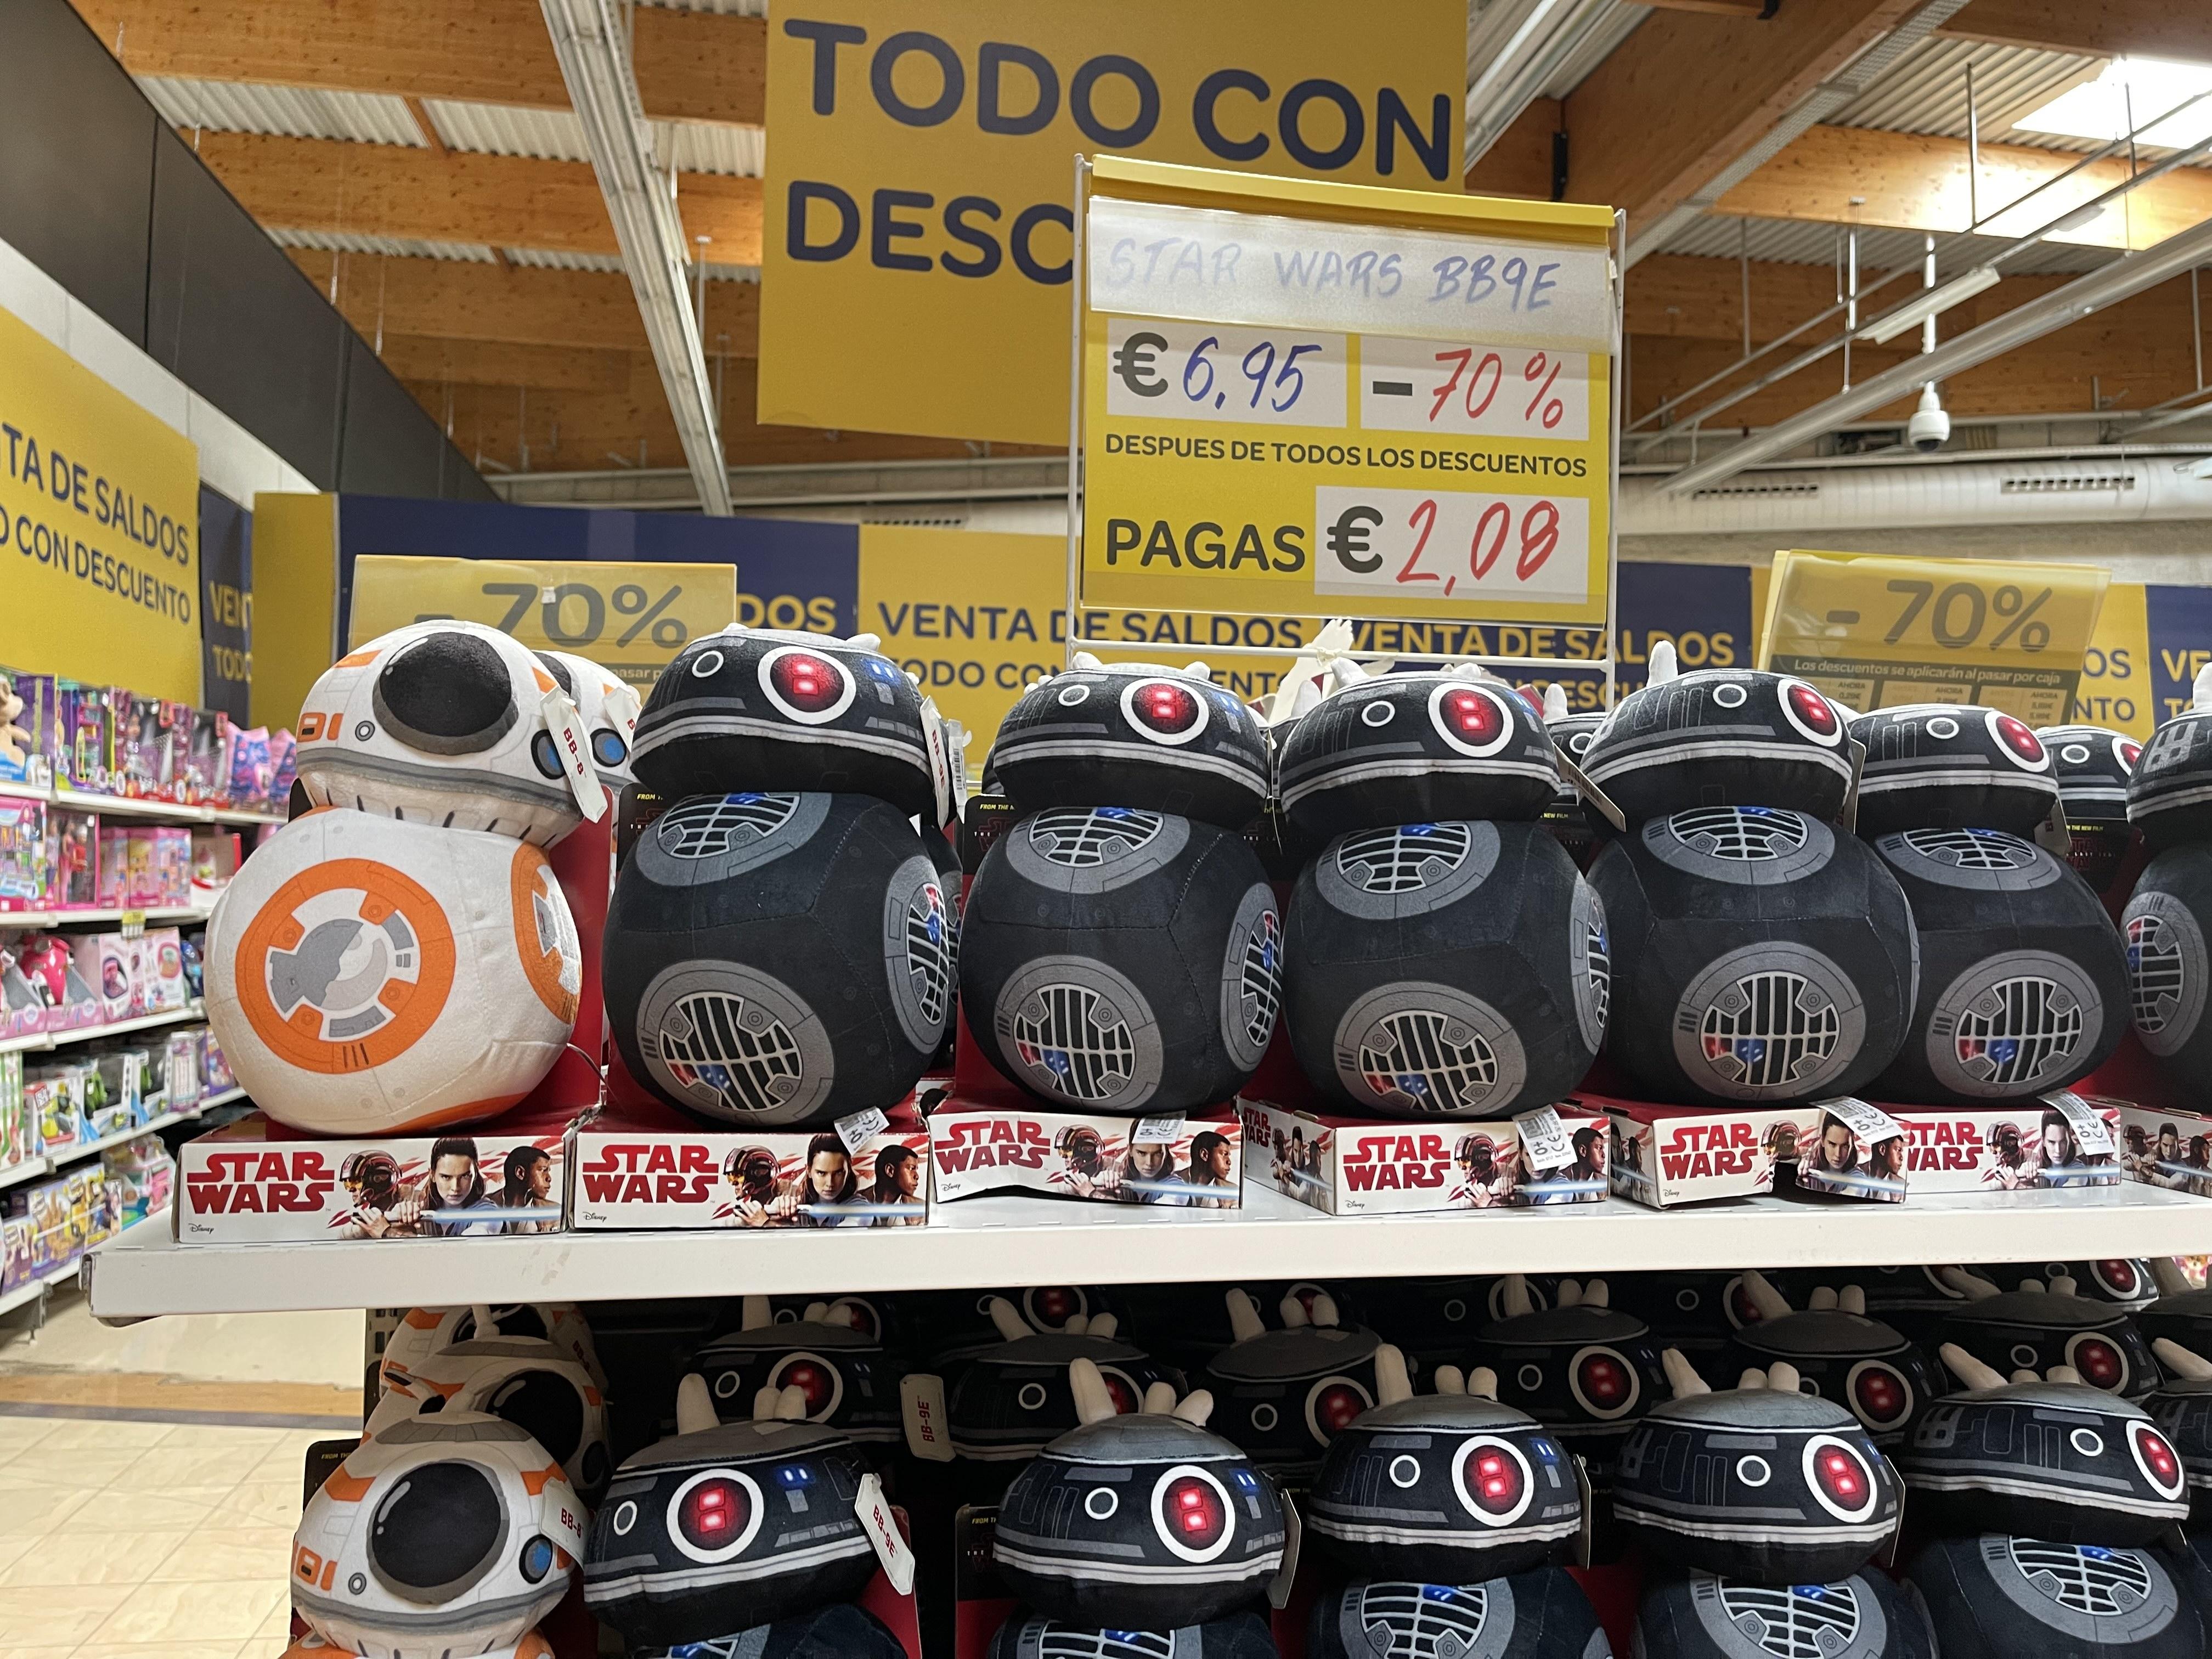 Peluches Star Wars, BB8, BB9… (Carrefour Atalayas, Murcia)